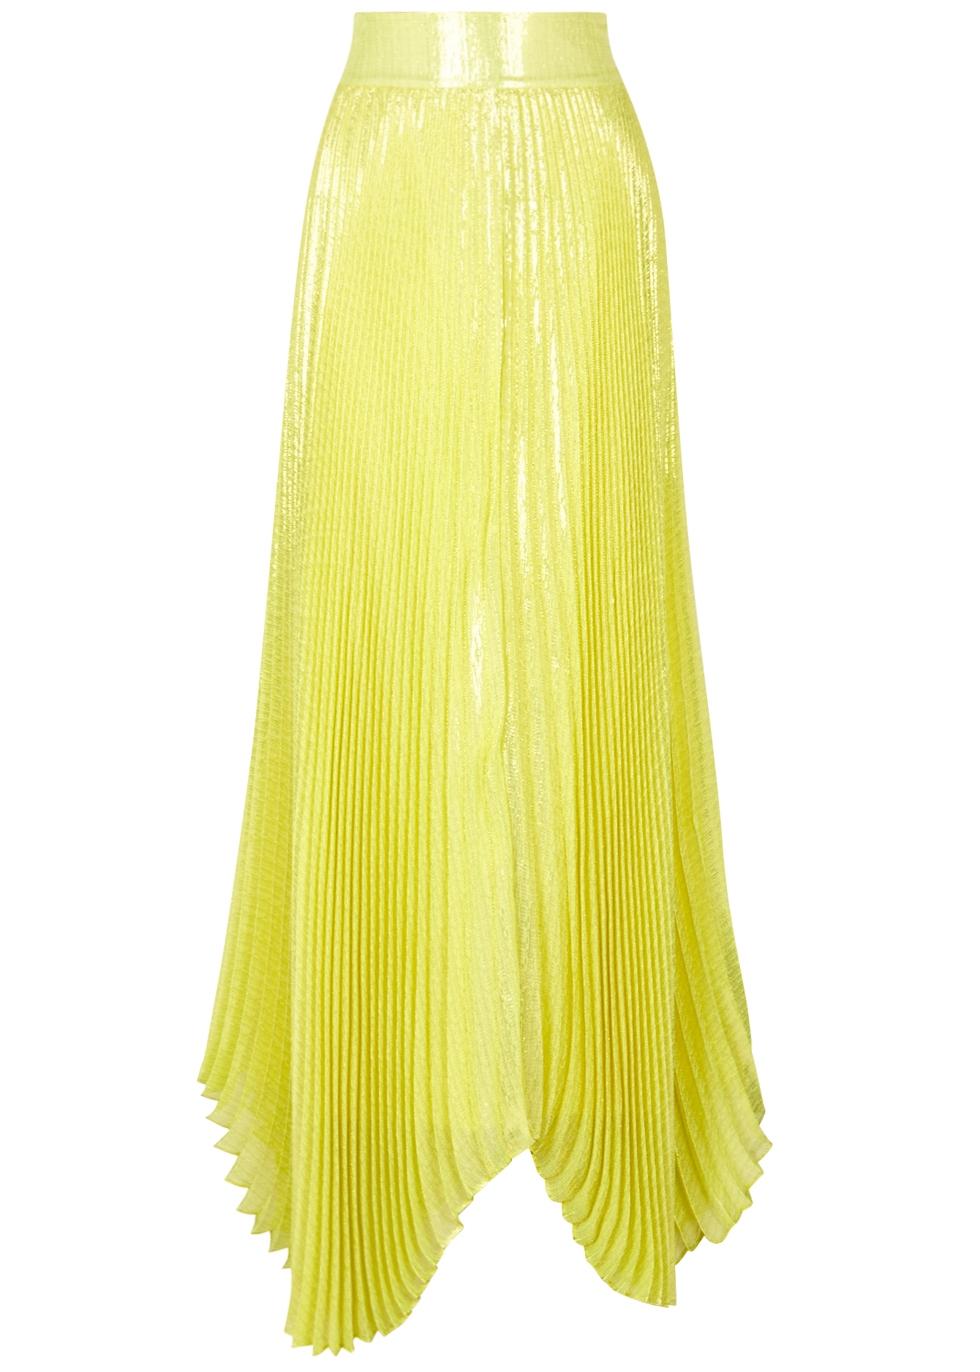 Katz Pleated Lamé Maxi Skirt, Yellow